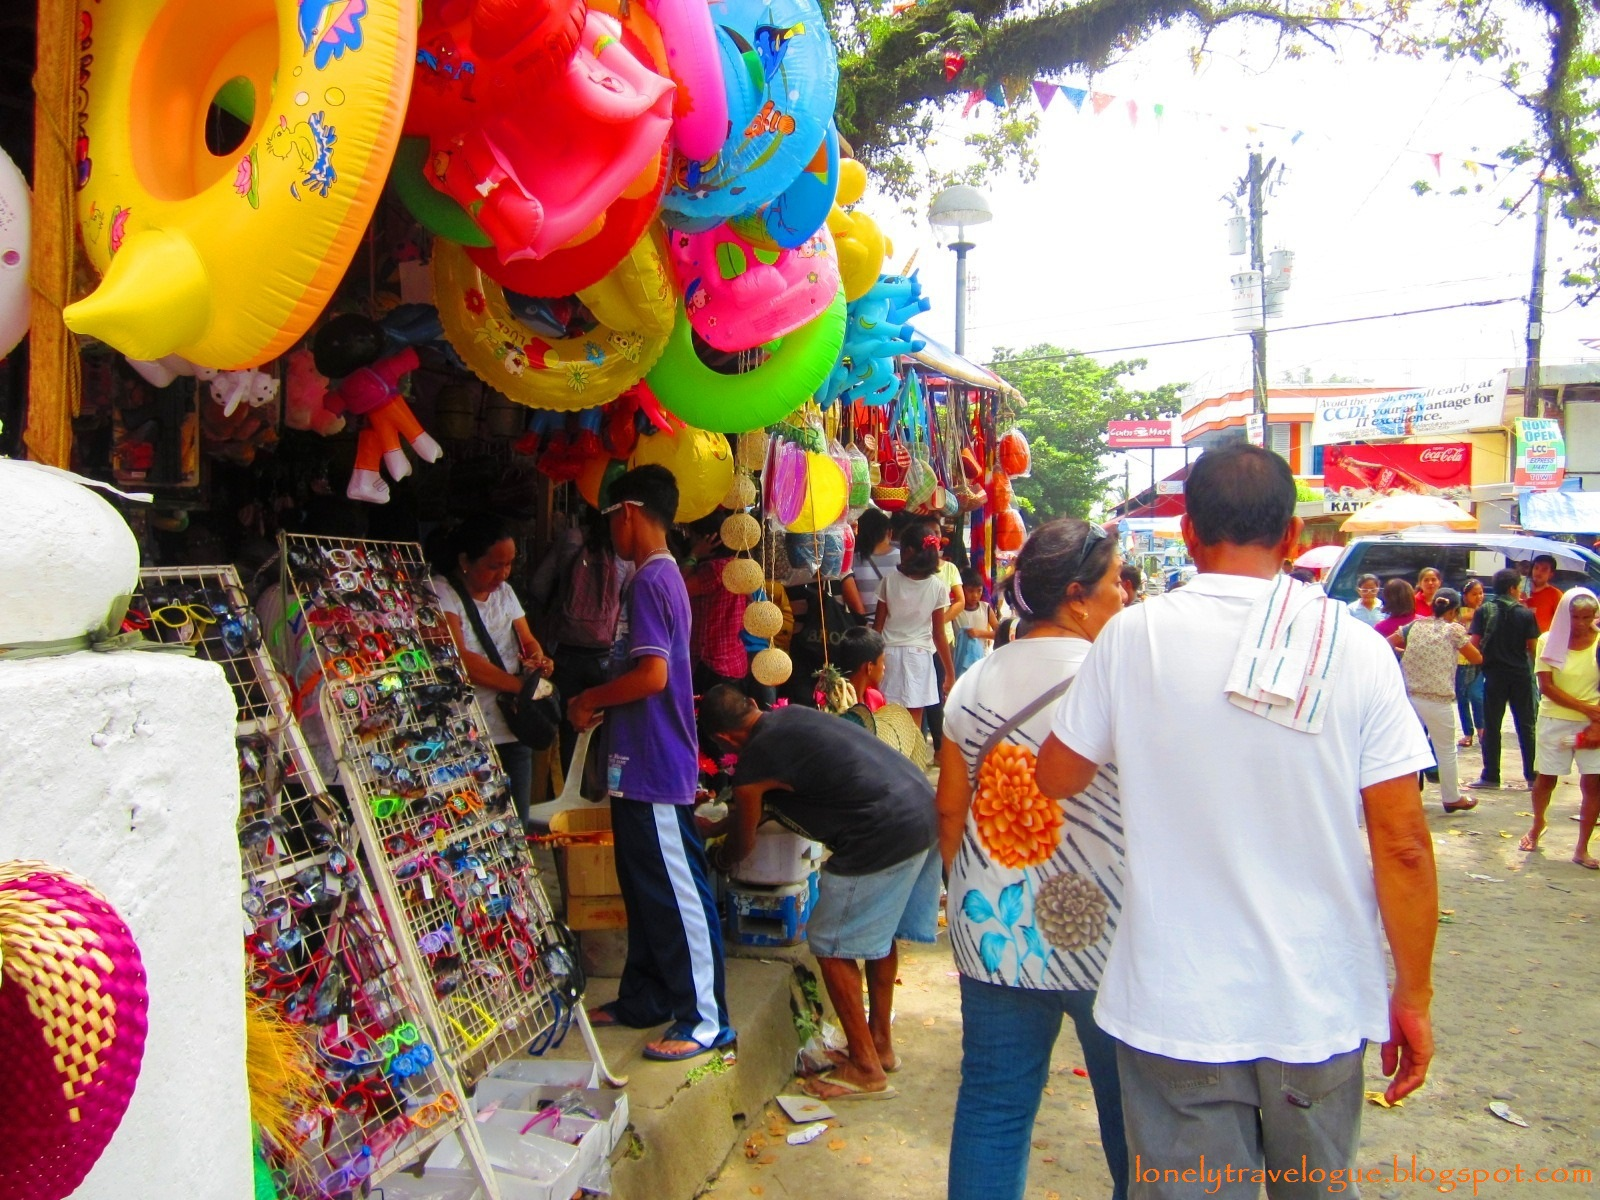 lonely travelogue: bicol part 1: tiwi, legaspi, daraga and ligao